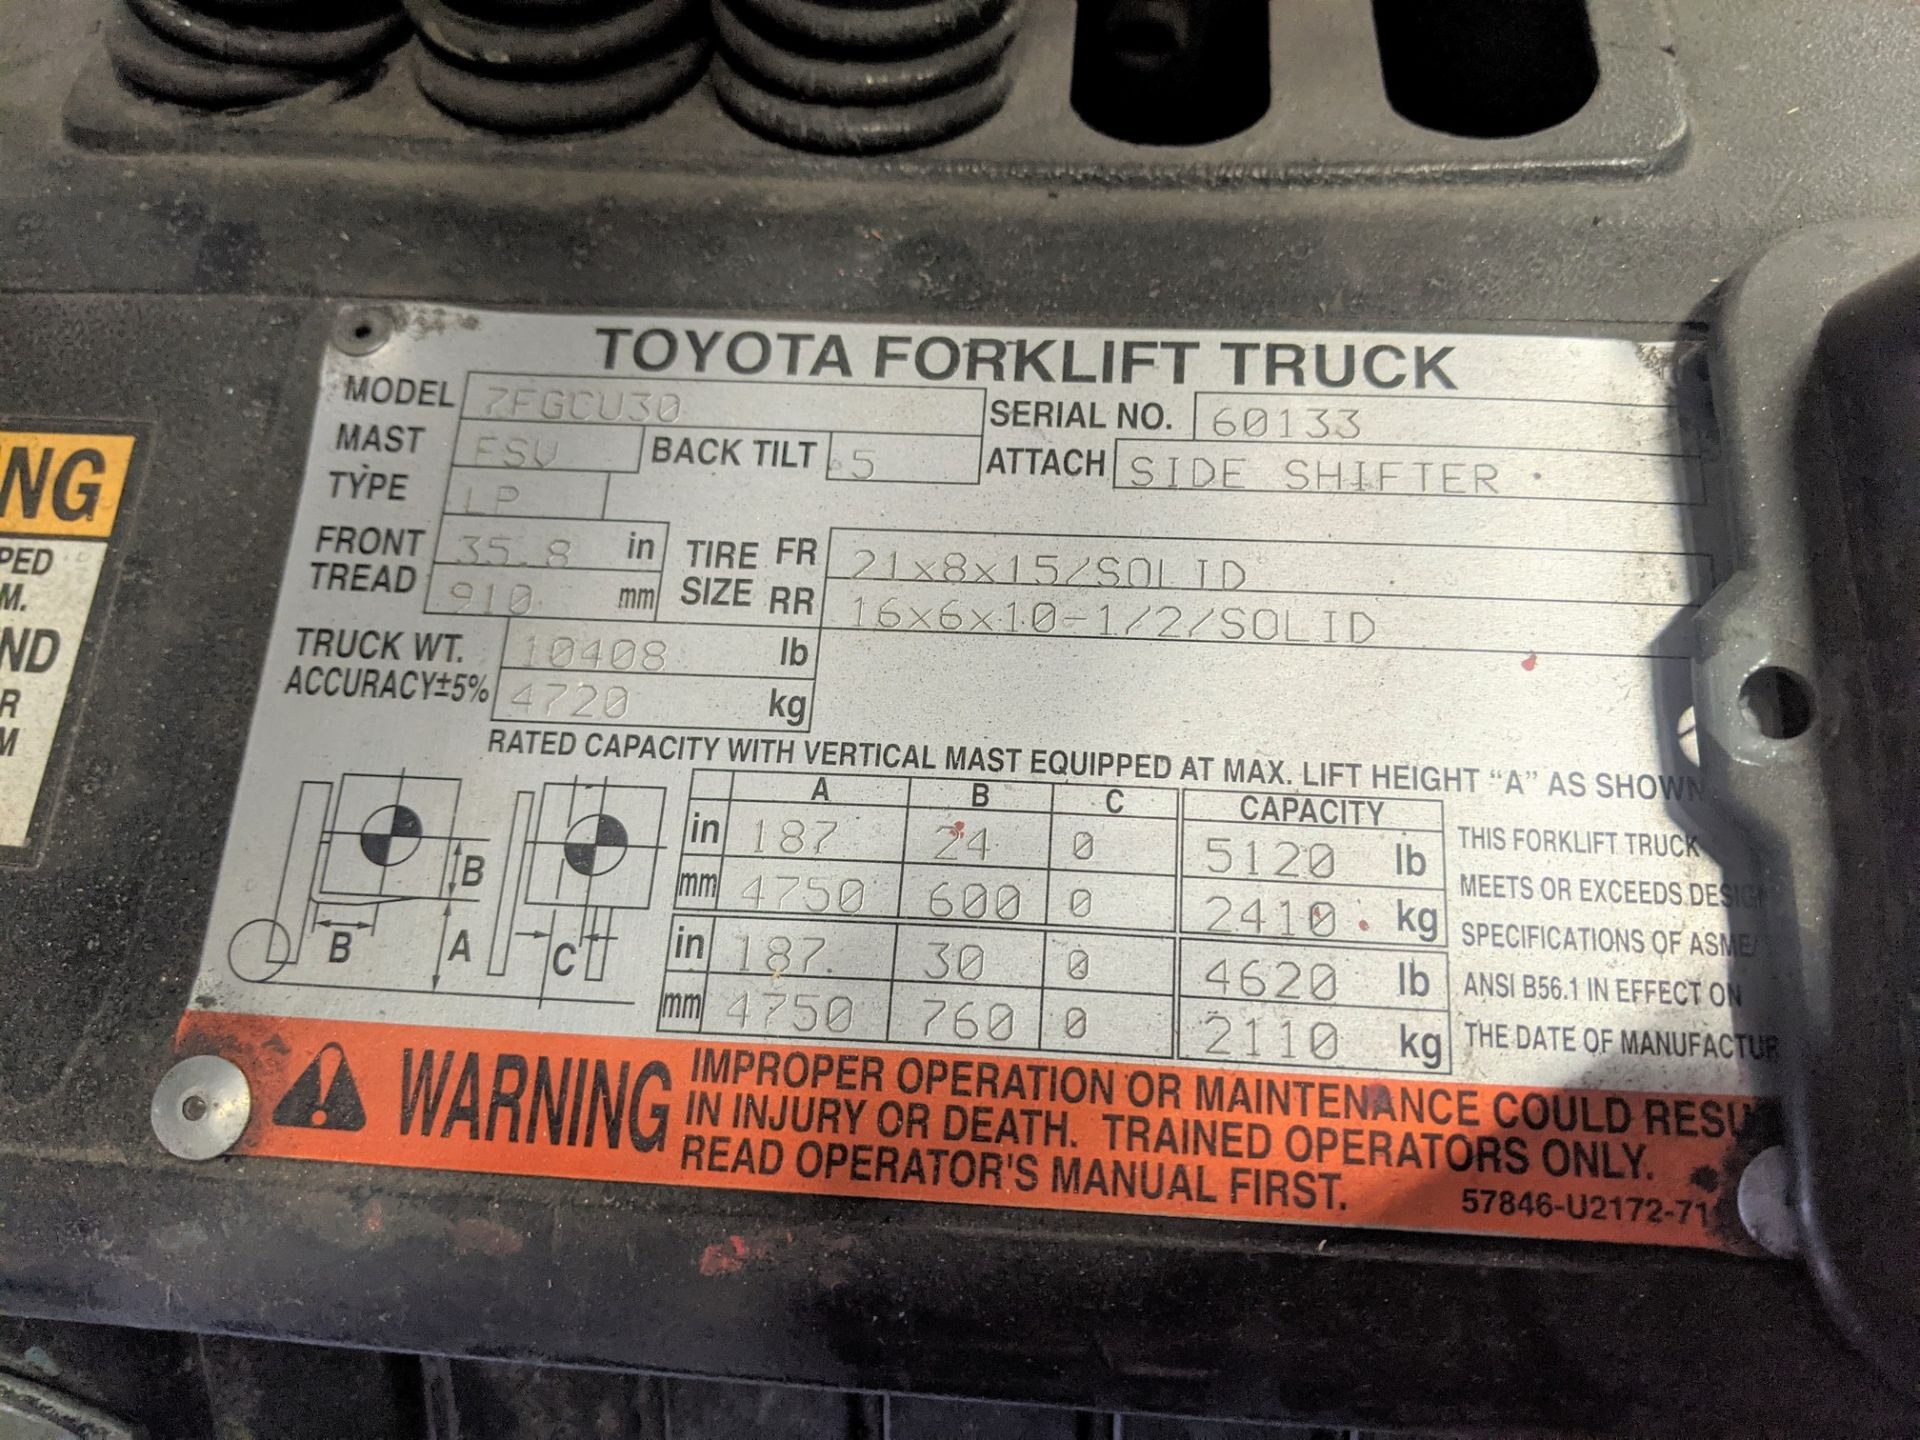 "TOYOTA 7FGCU30 PROPANE FORKLIFT, 5,120LB CAP., 187"" MAX LIFT, 3-STAGE MAST, SIDE SHIFT, S/N 60133, - Image 5 of 13"